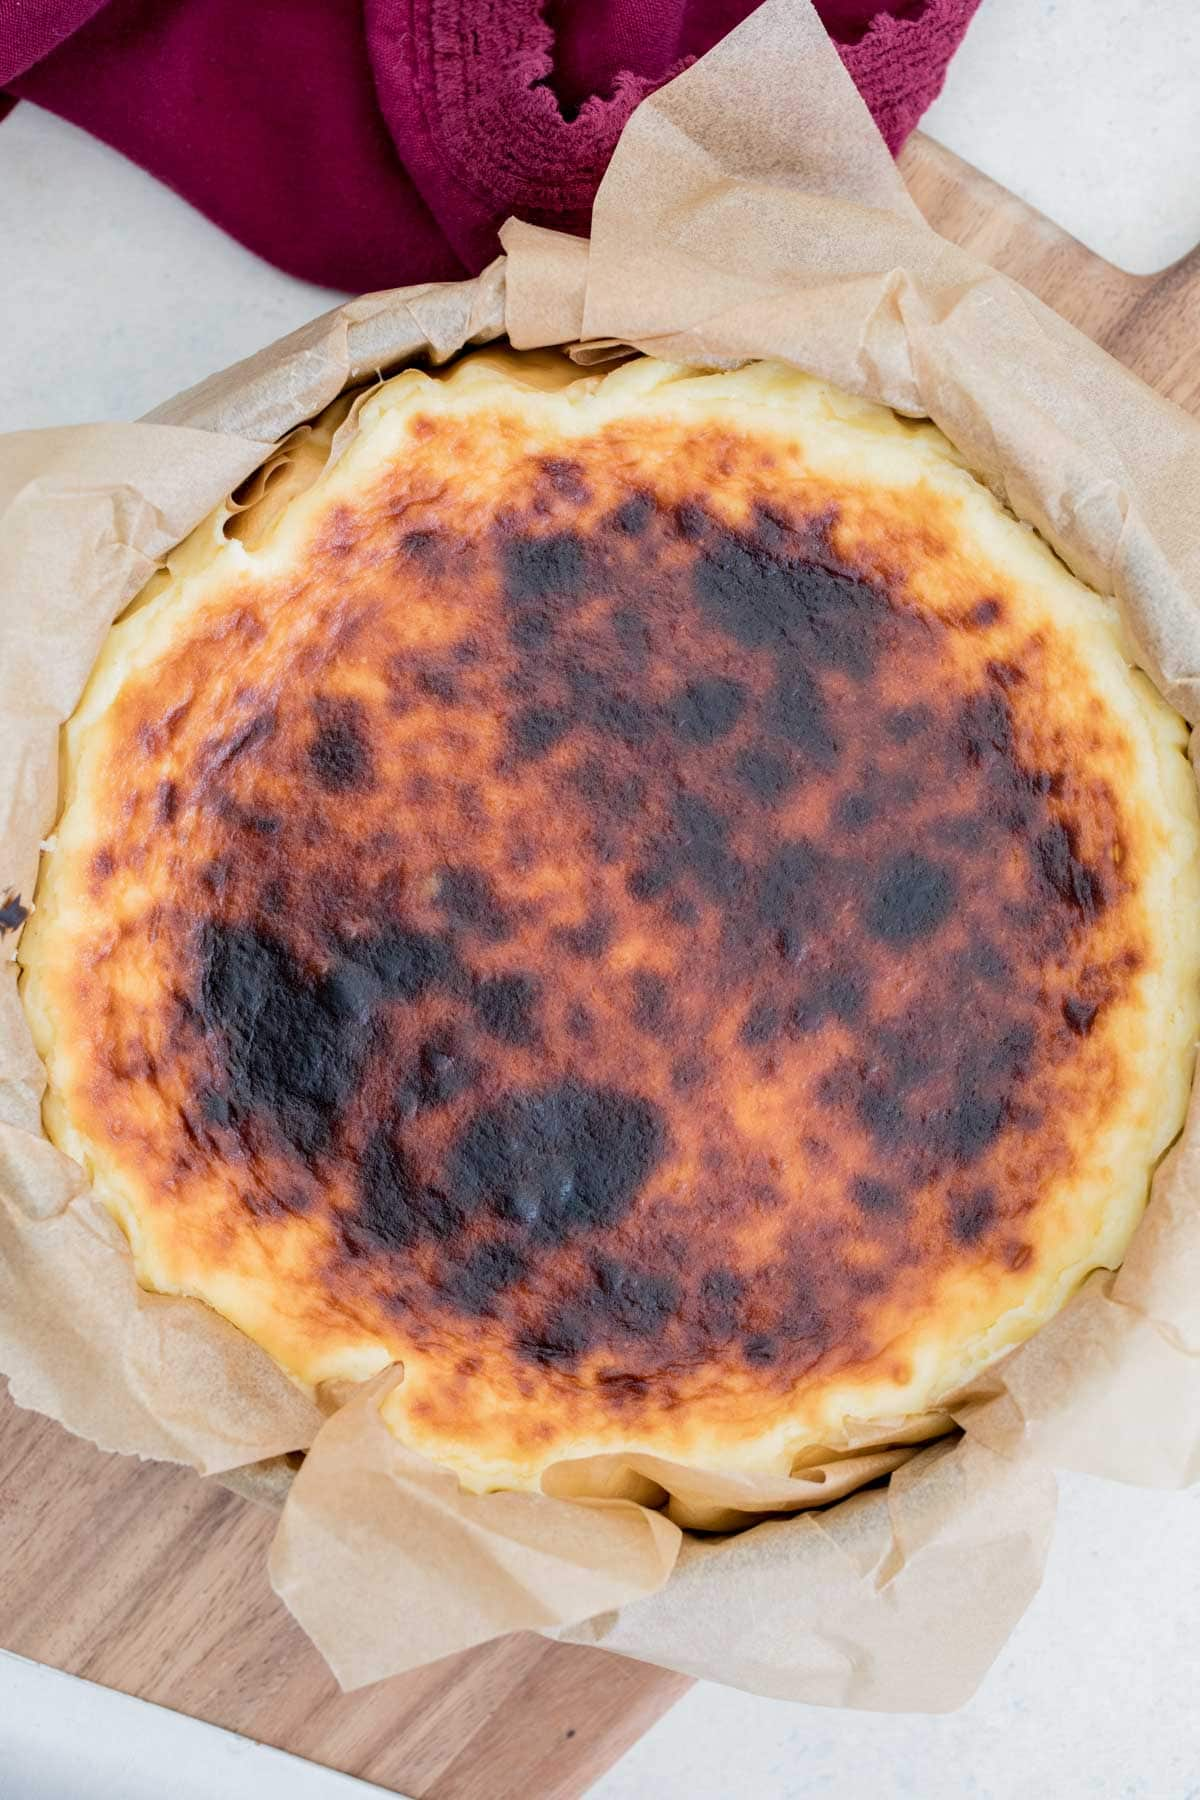 Finished basque cheesecake